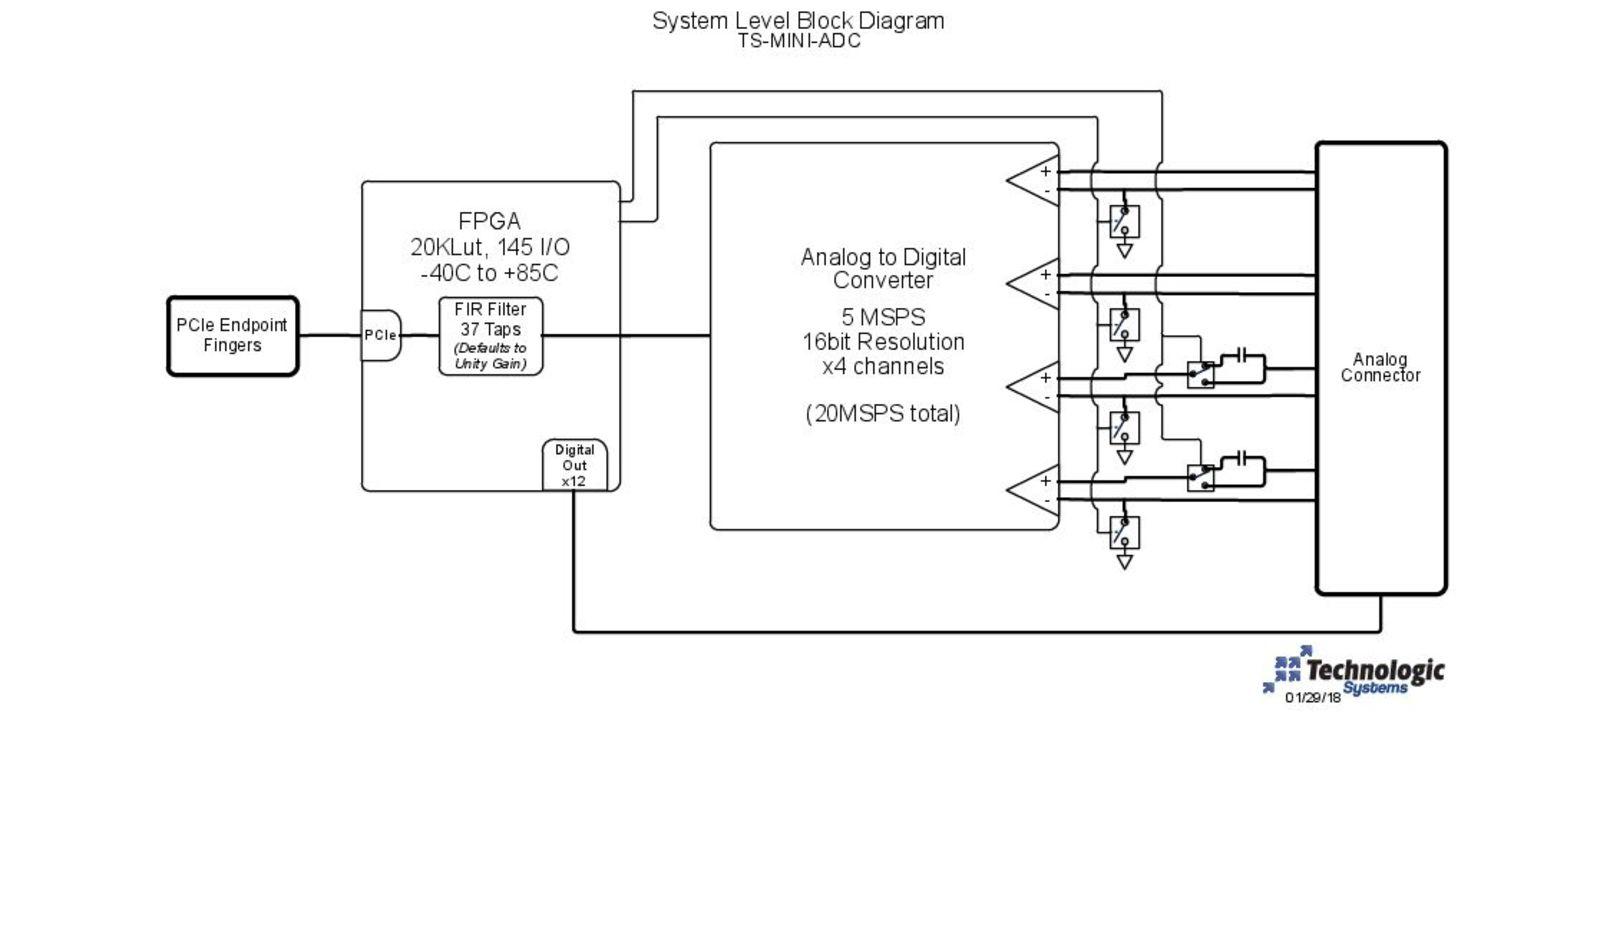 TS-MINI-ADC Block Diagram Image